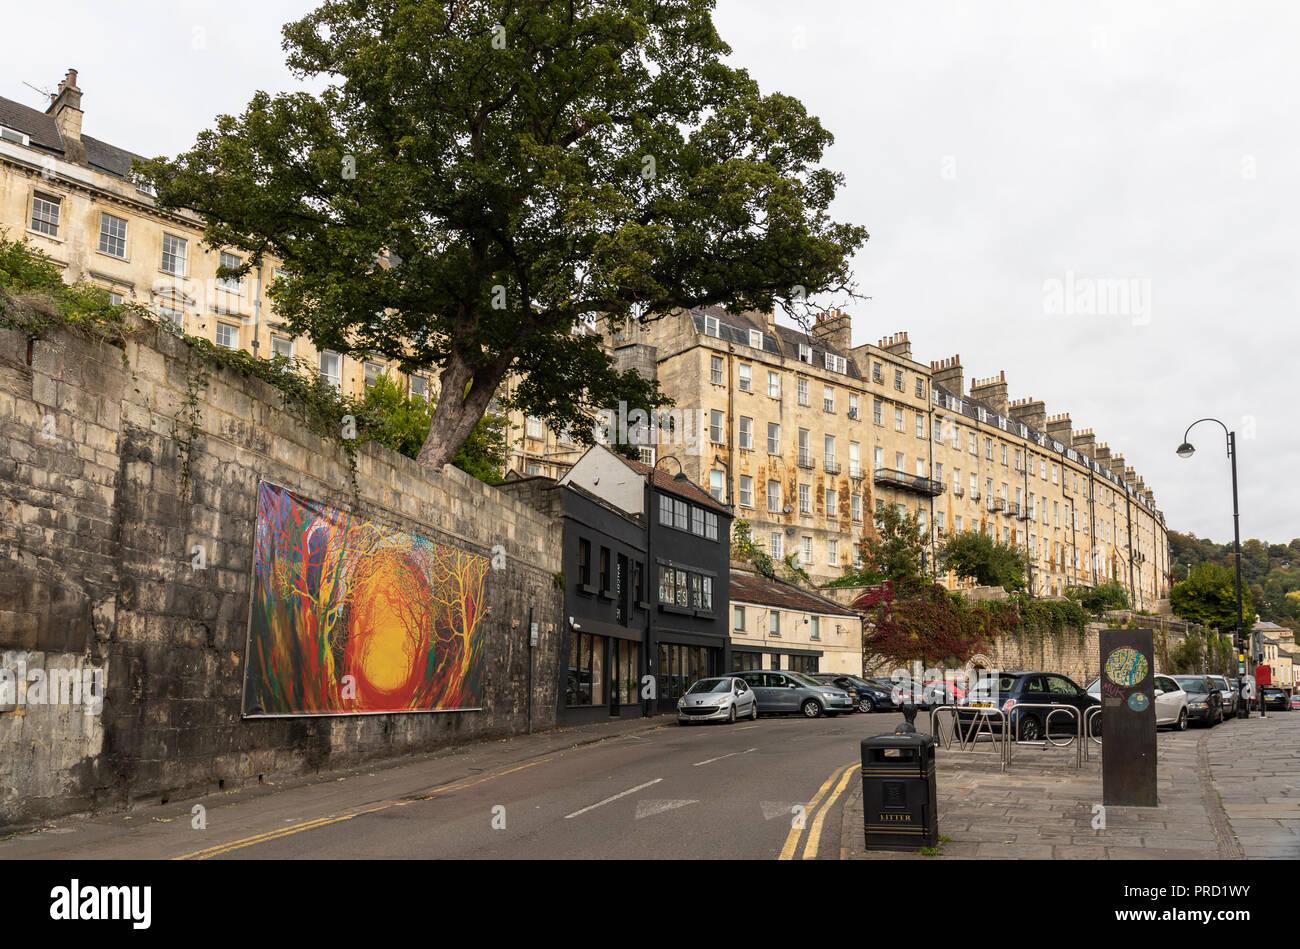 Walcot Street -The Artisan Quarter, Bath, England - Stock Image